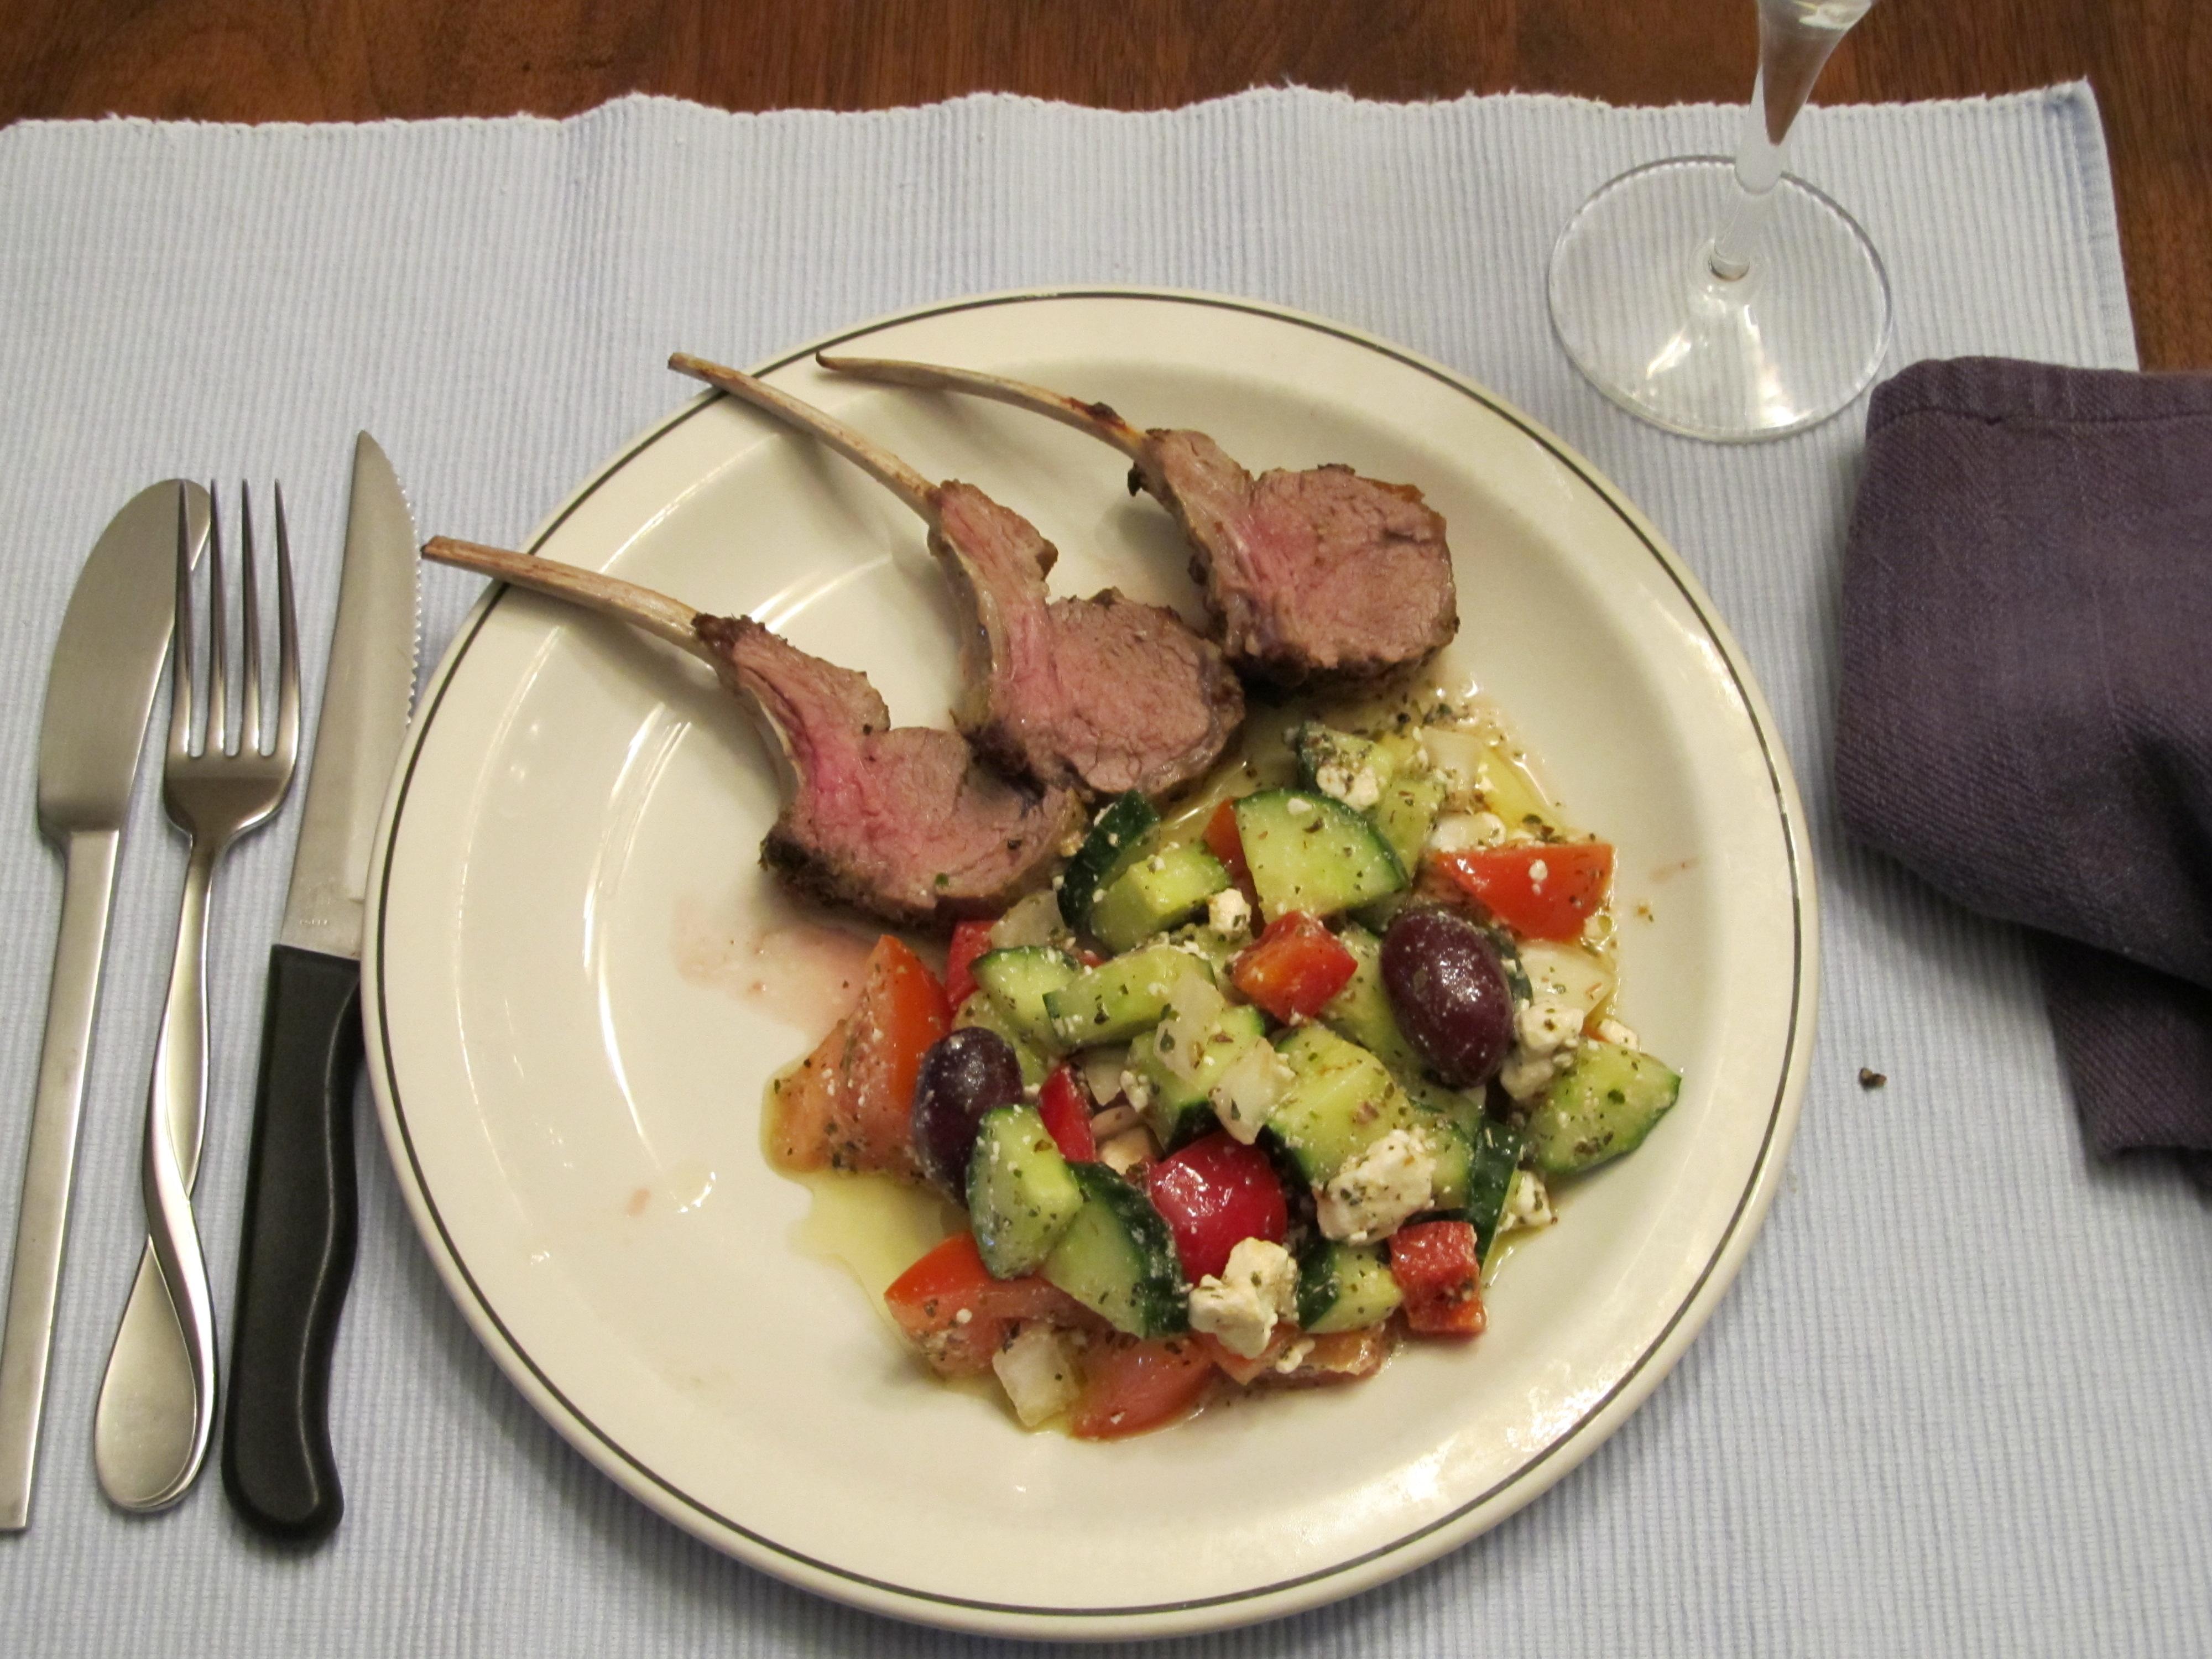 Pommery Mustard Rub Welsh Spring Lamb Chops/ Sheep Feta Mediterain Salad.